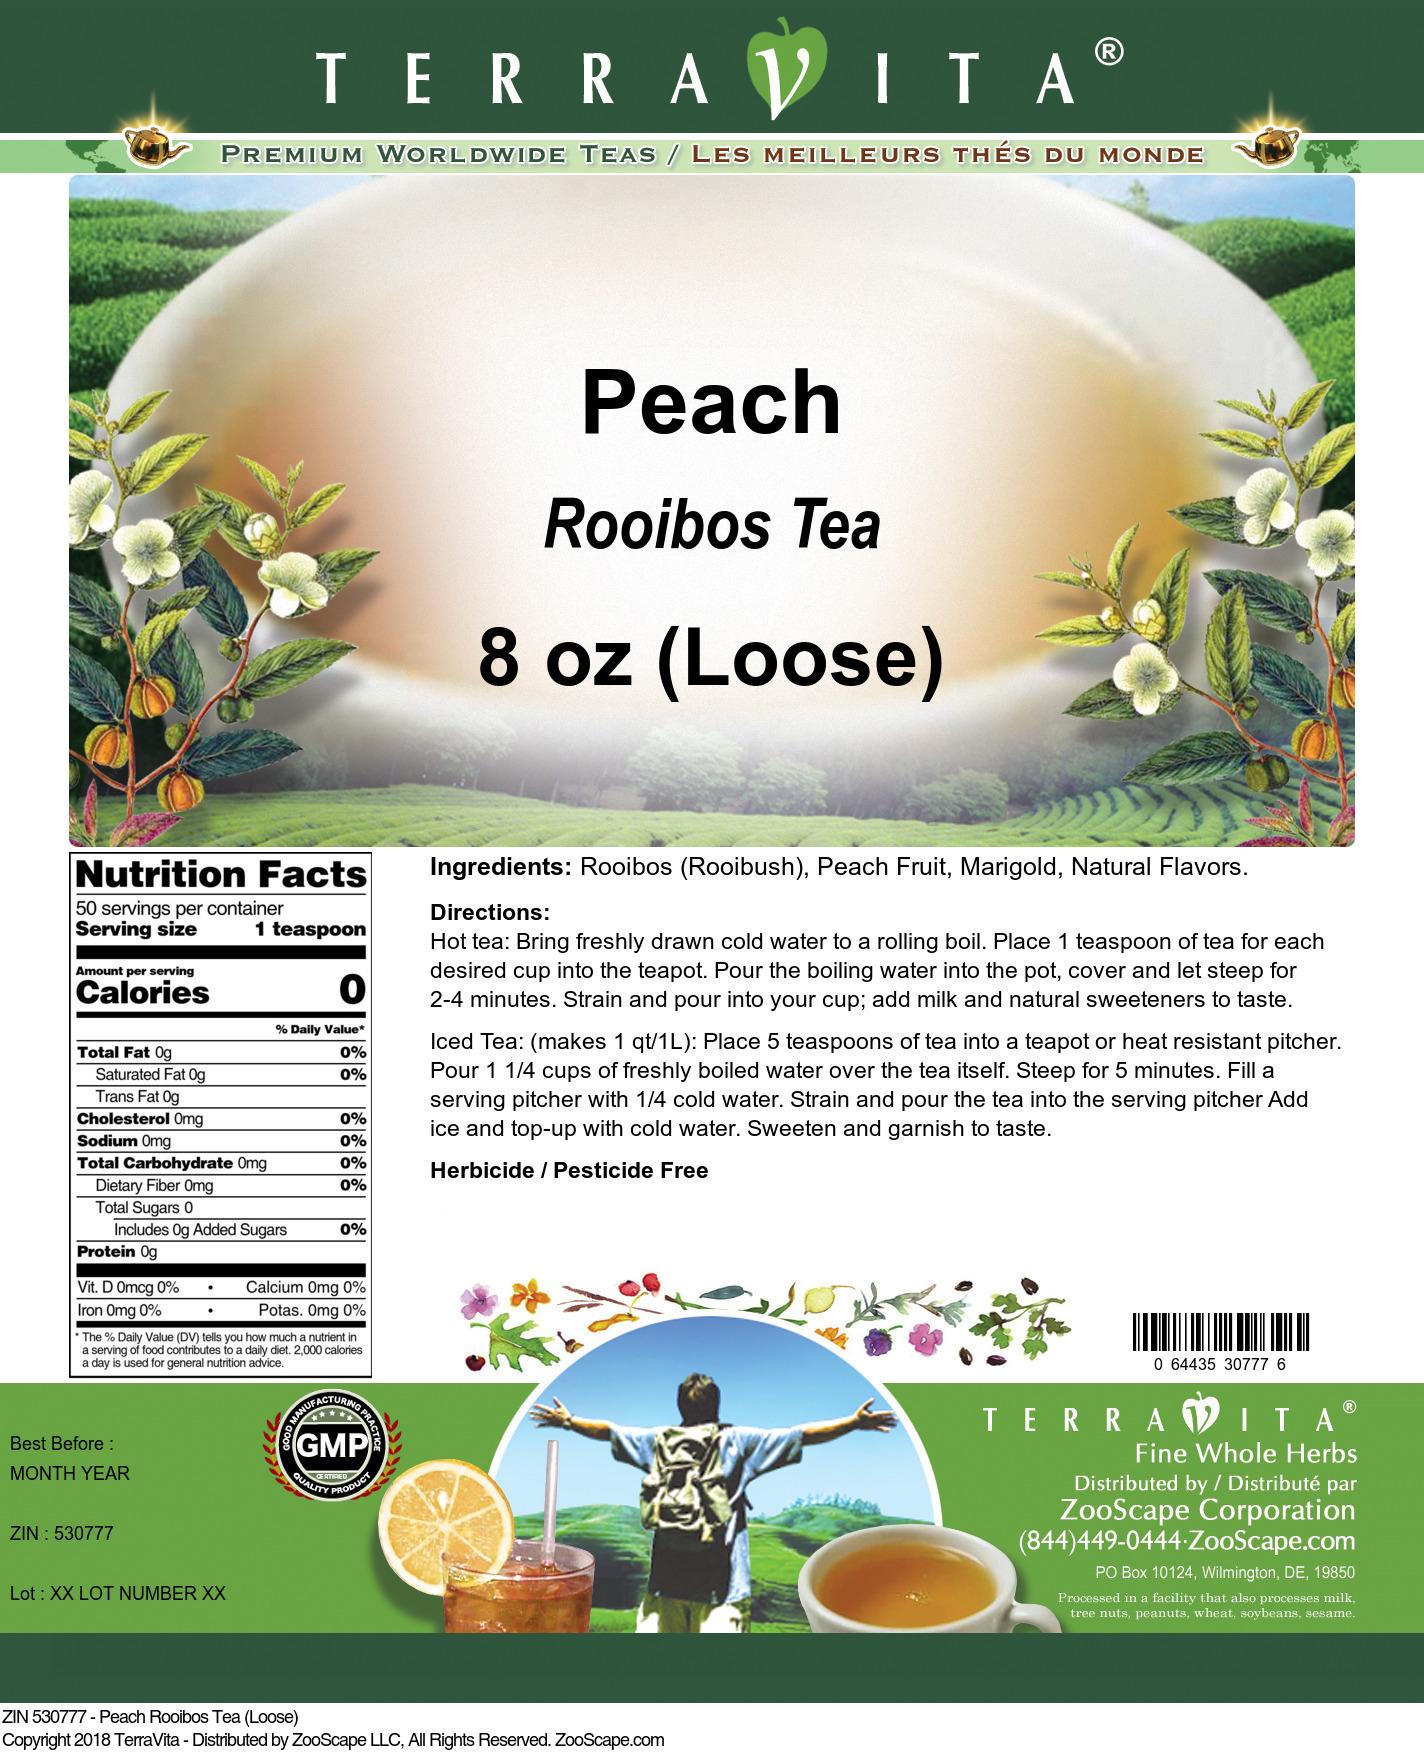 Peach Rooibos Tea (Loose)